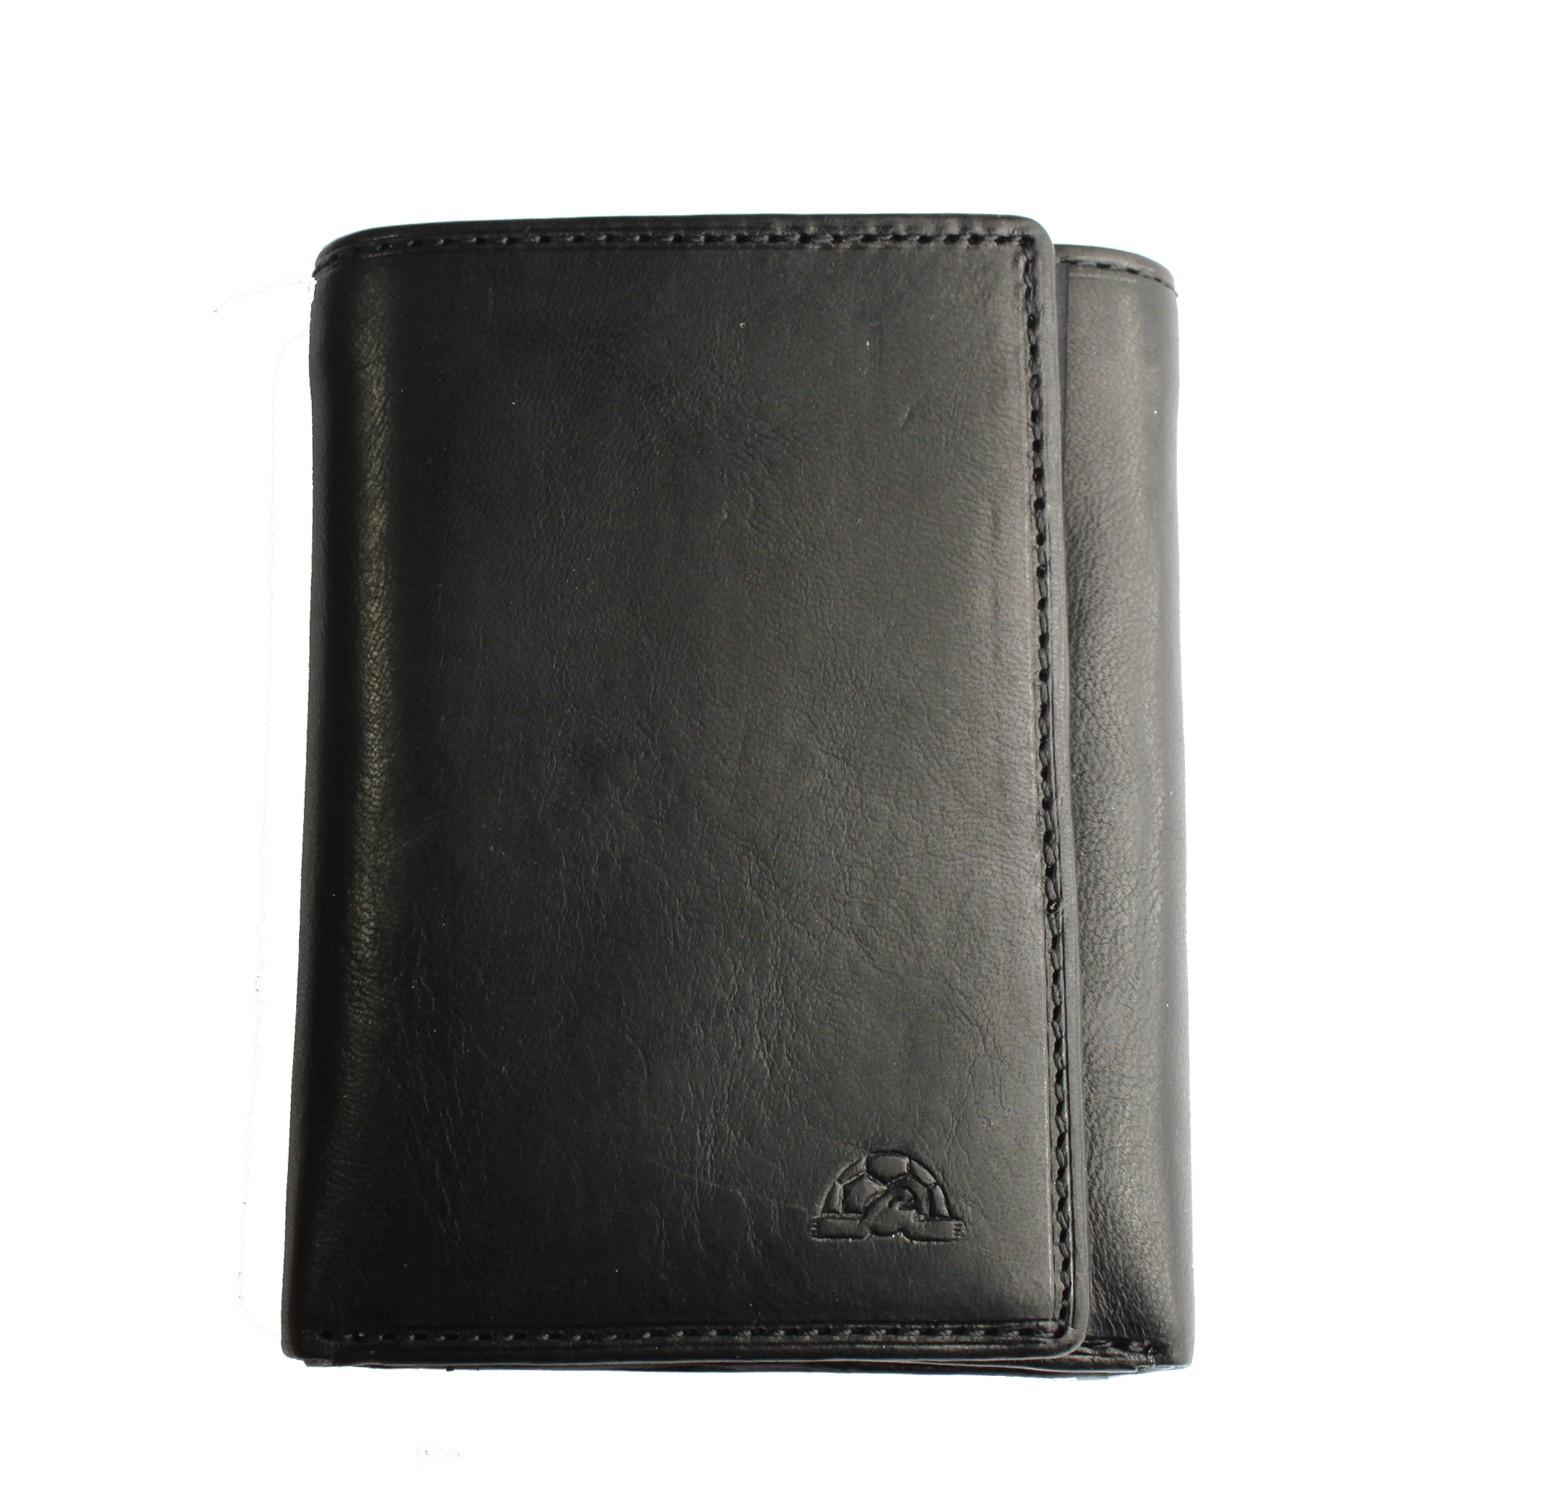 Leather Tri Fold Wallet Tony Perotti Italian Leather Black  TP-2313G